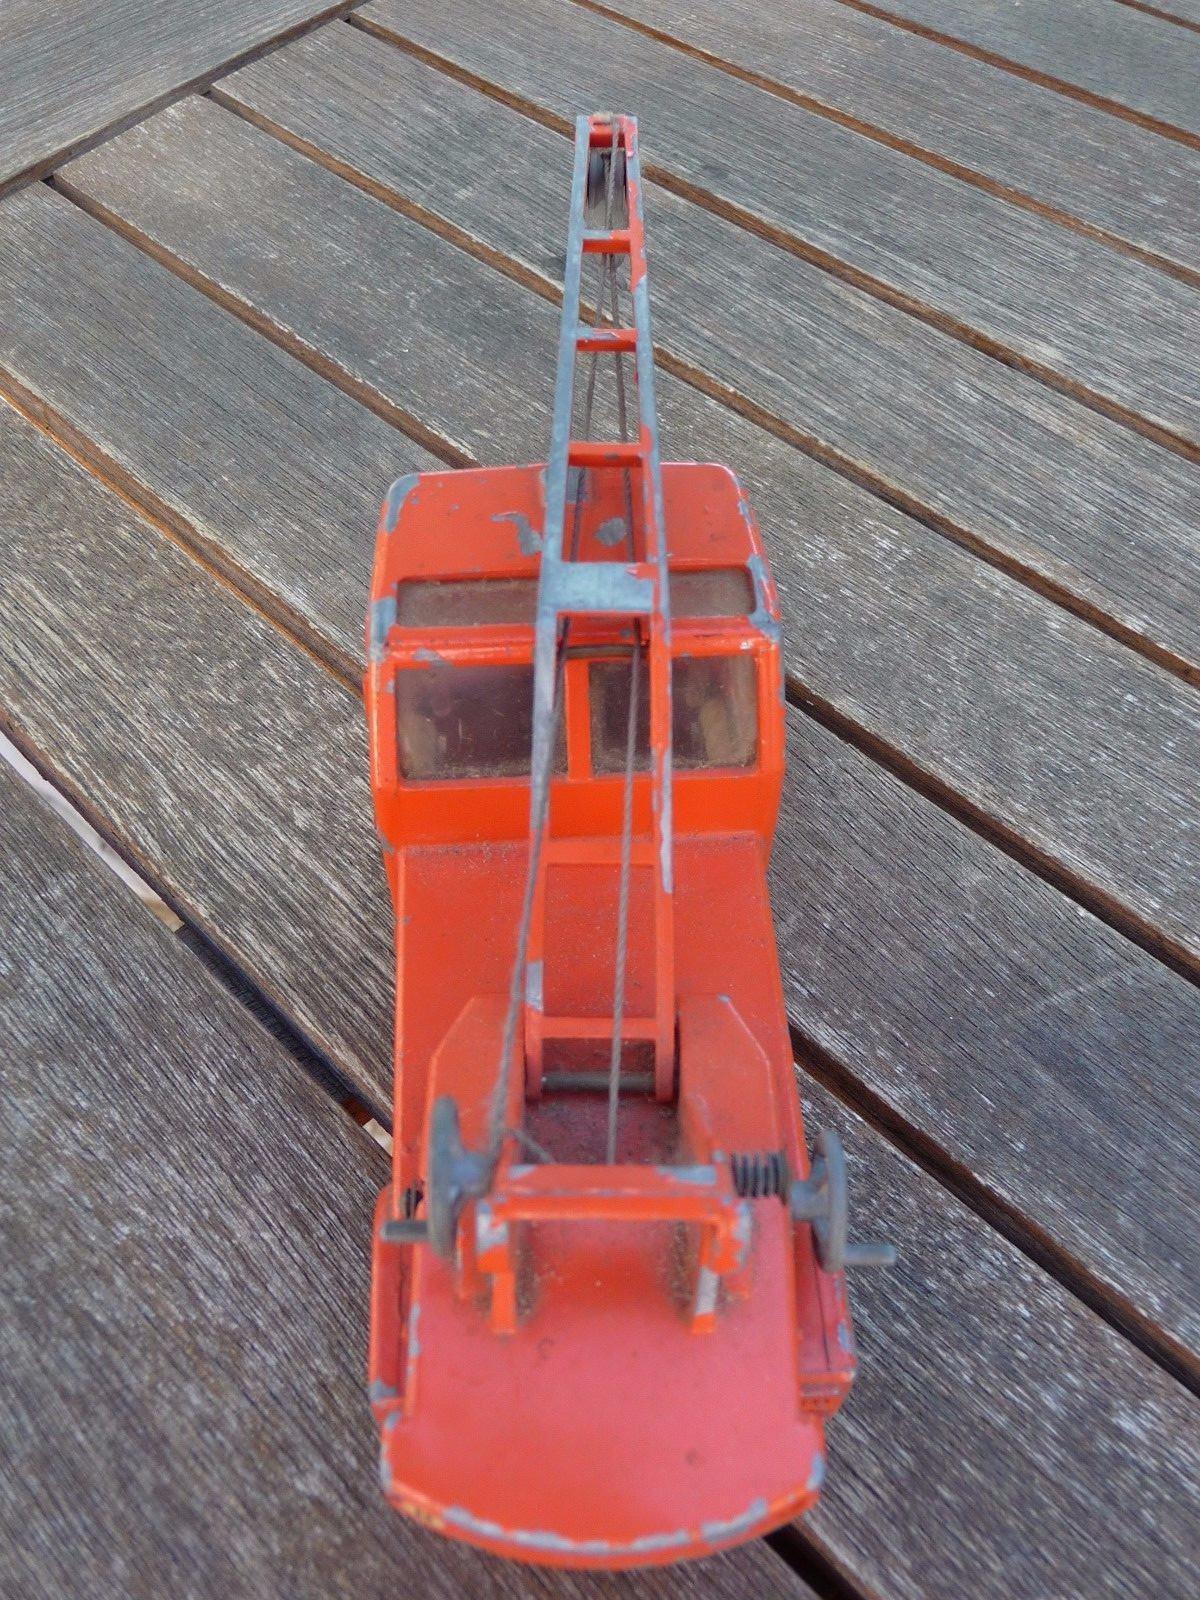 Superbe ! JRD réf. 125  Grue mobile mobile mobile CACL J WEITZ sur châssis AG  20.45 TBE | Vogue  4e7f5c